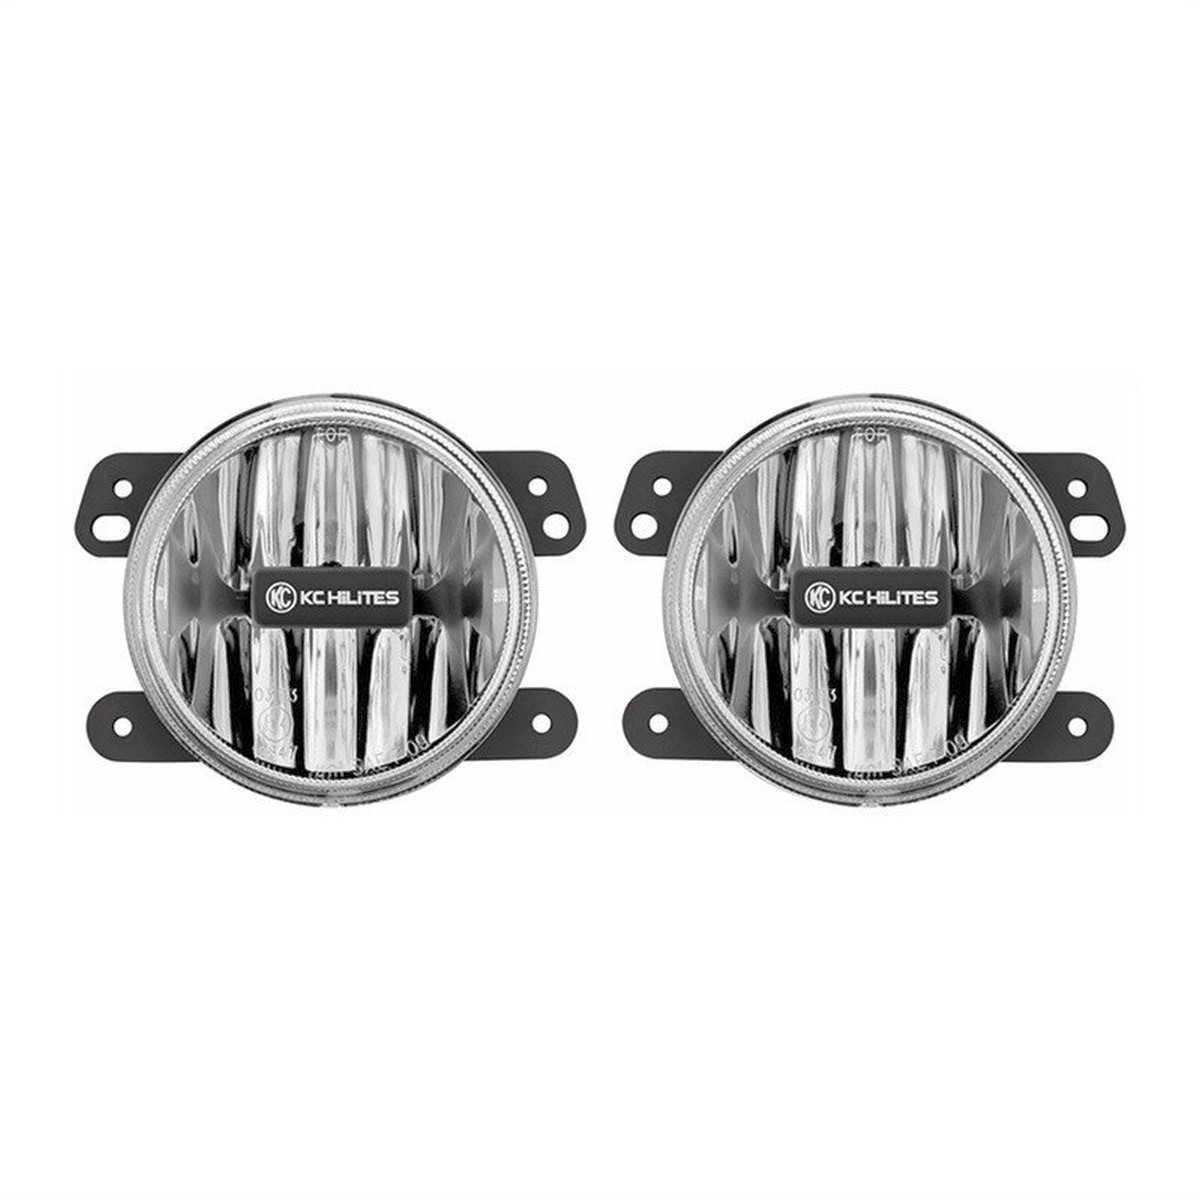 KC HILITES DRIVING LIGHT SYSTEMS - Gravity LED G4 Fog Light Pair Pack System-Amber-Jeep JK(2010 - 2018) - KCH 498